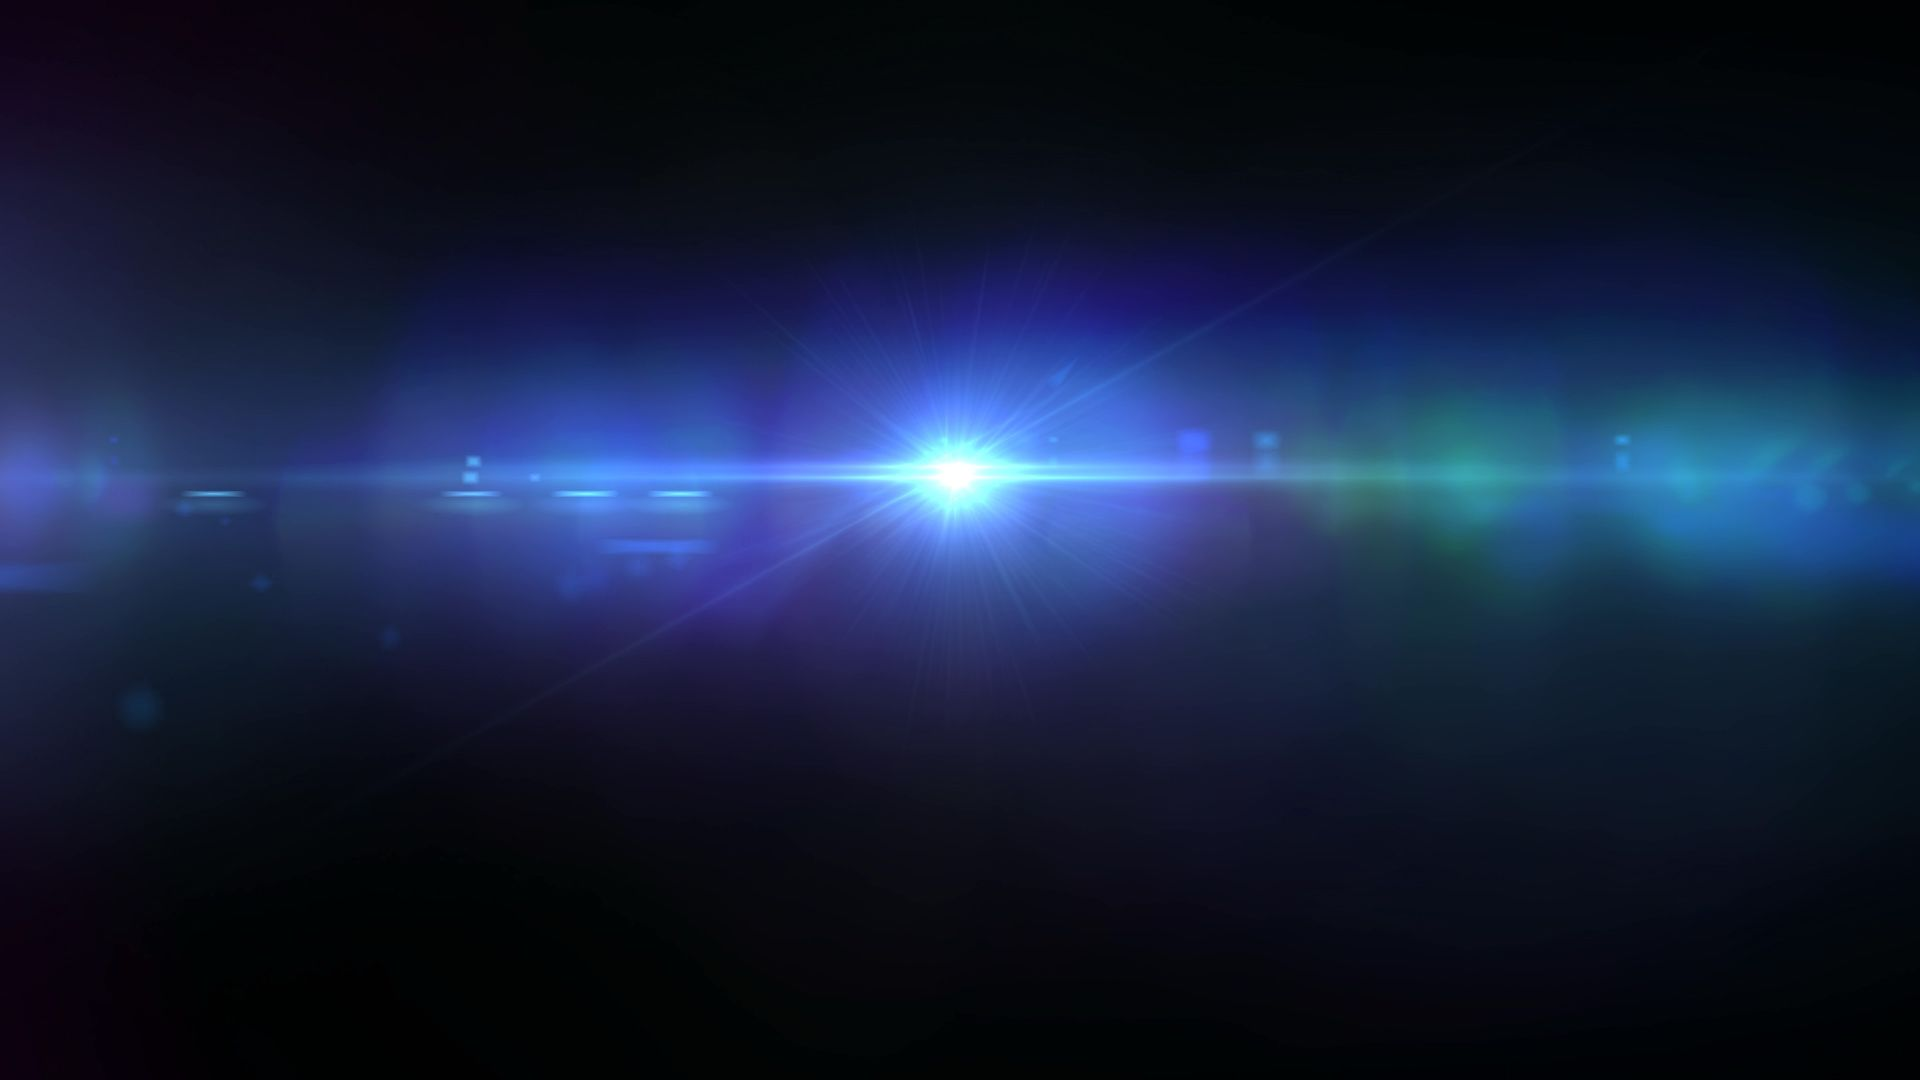 Lens flare adder